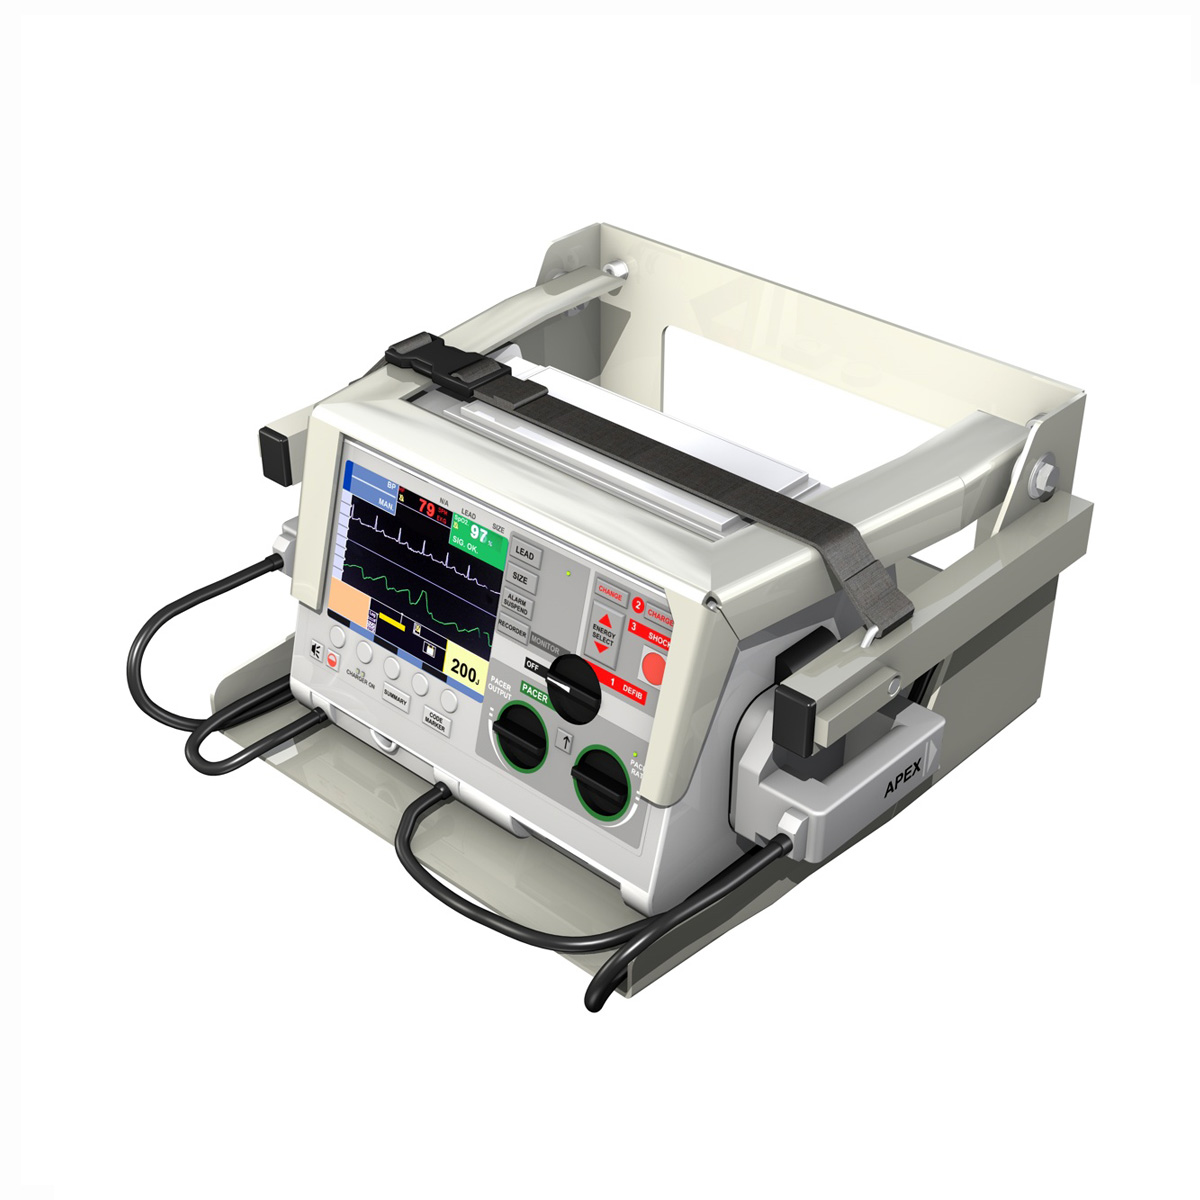 defibrillator 3d model 3ds c4d lwo obj 264209